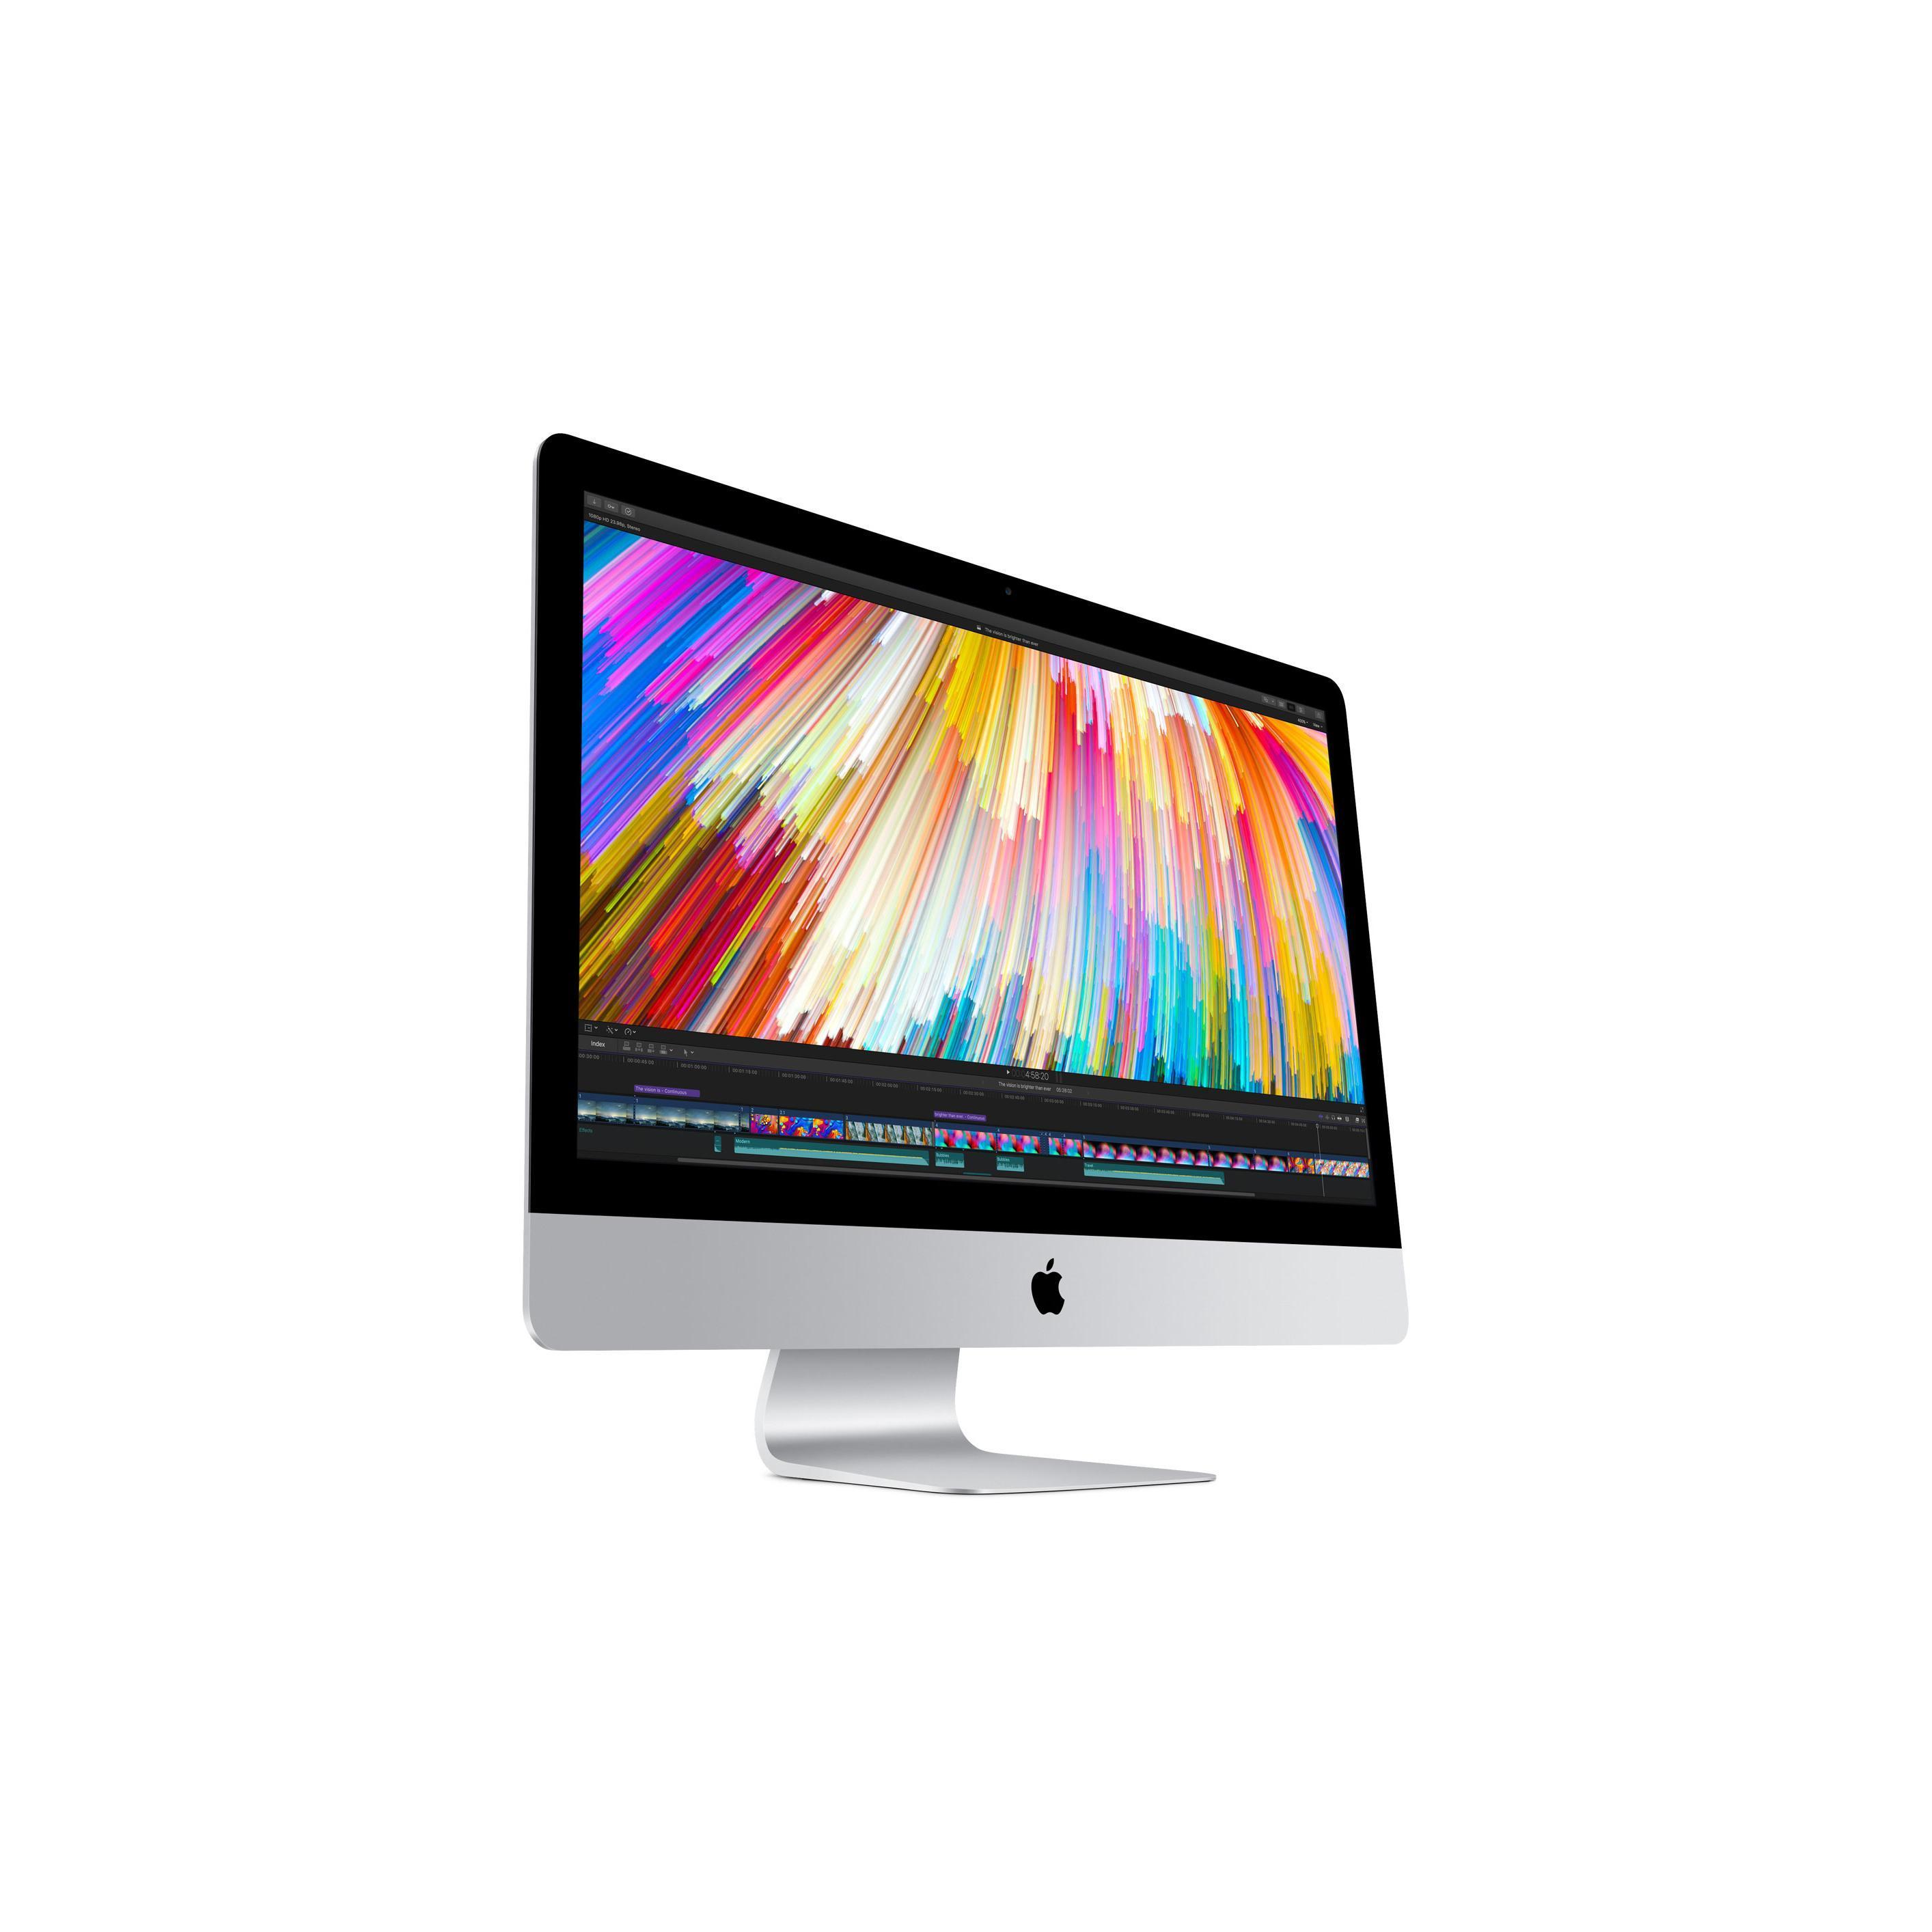 "iMac 27"" 5K (Late 2015) Core i5 3,2 GHz - SSD 25 GB + HDD 1 TB - 8GB AZERTY - Ranska"